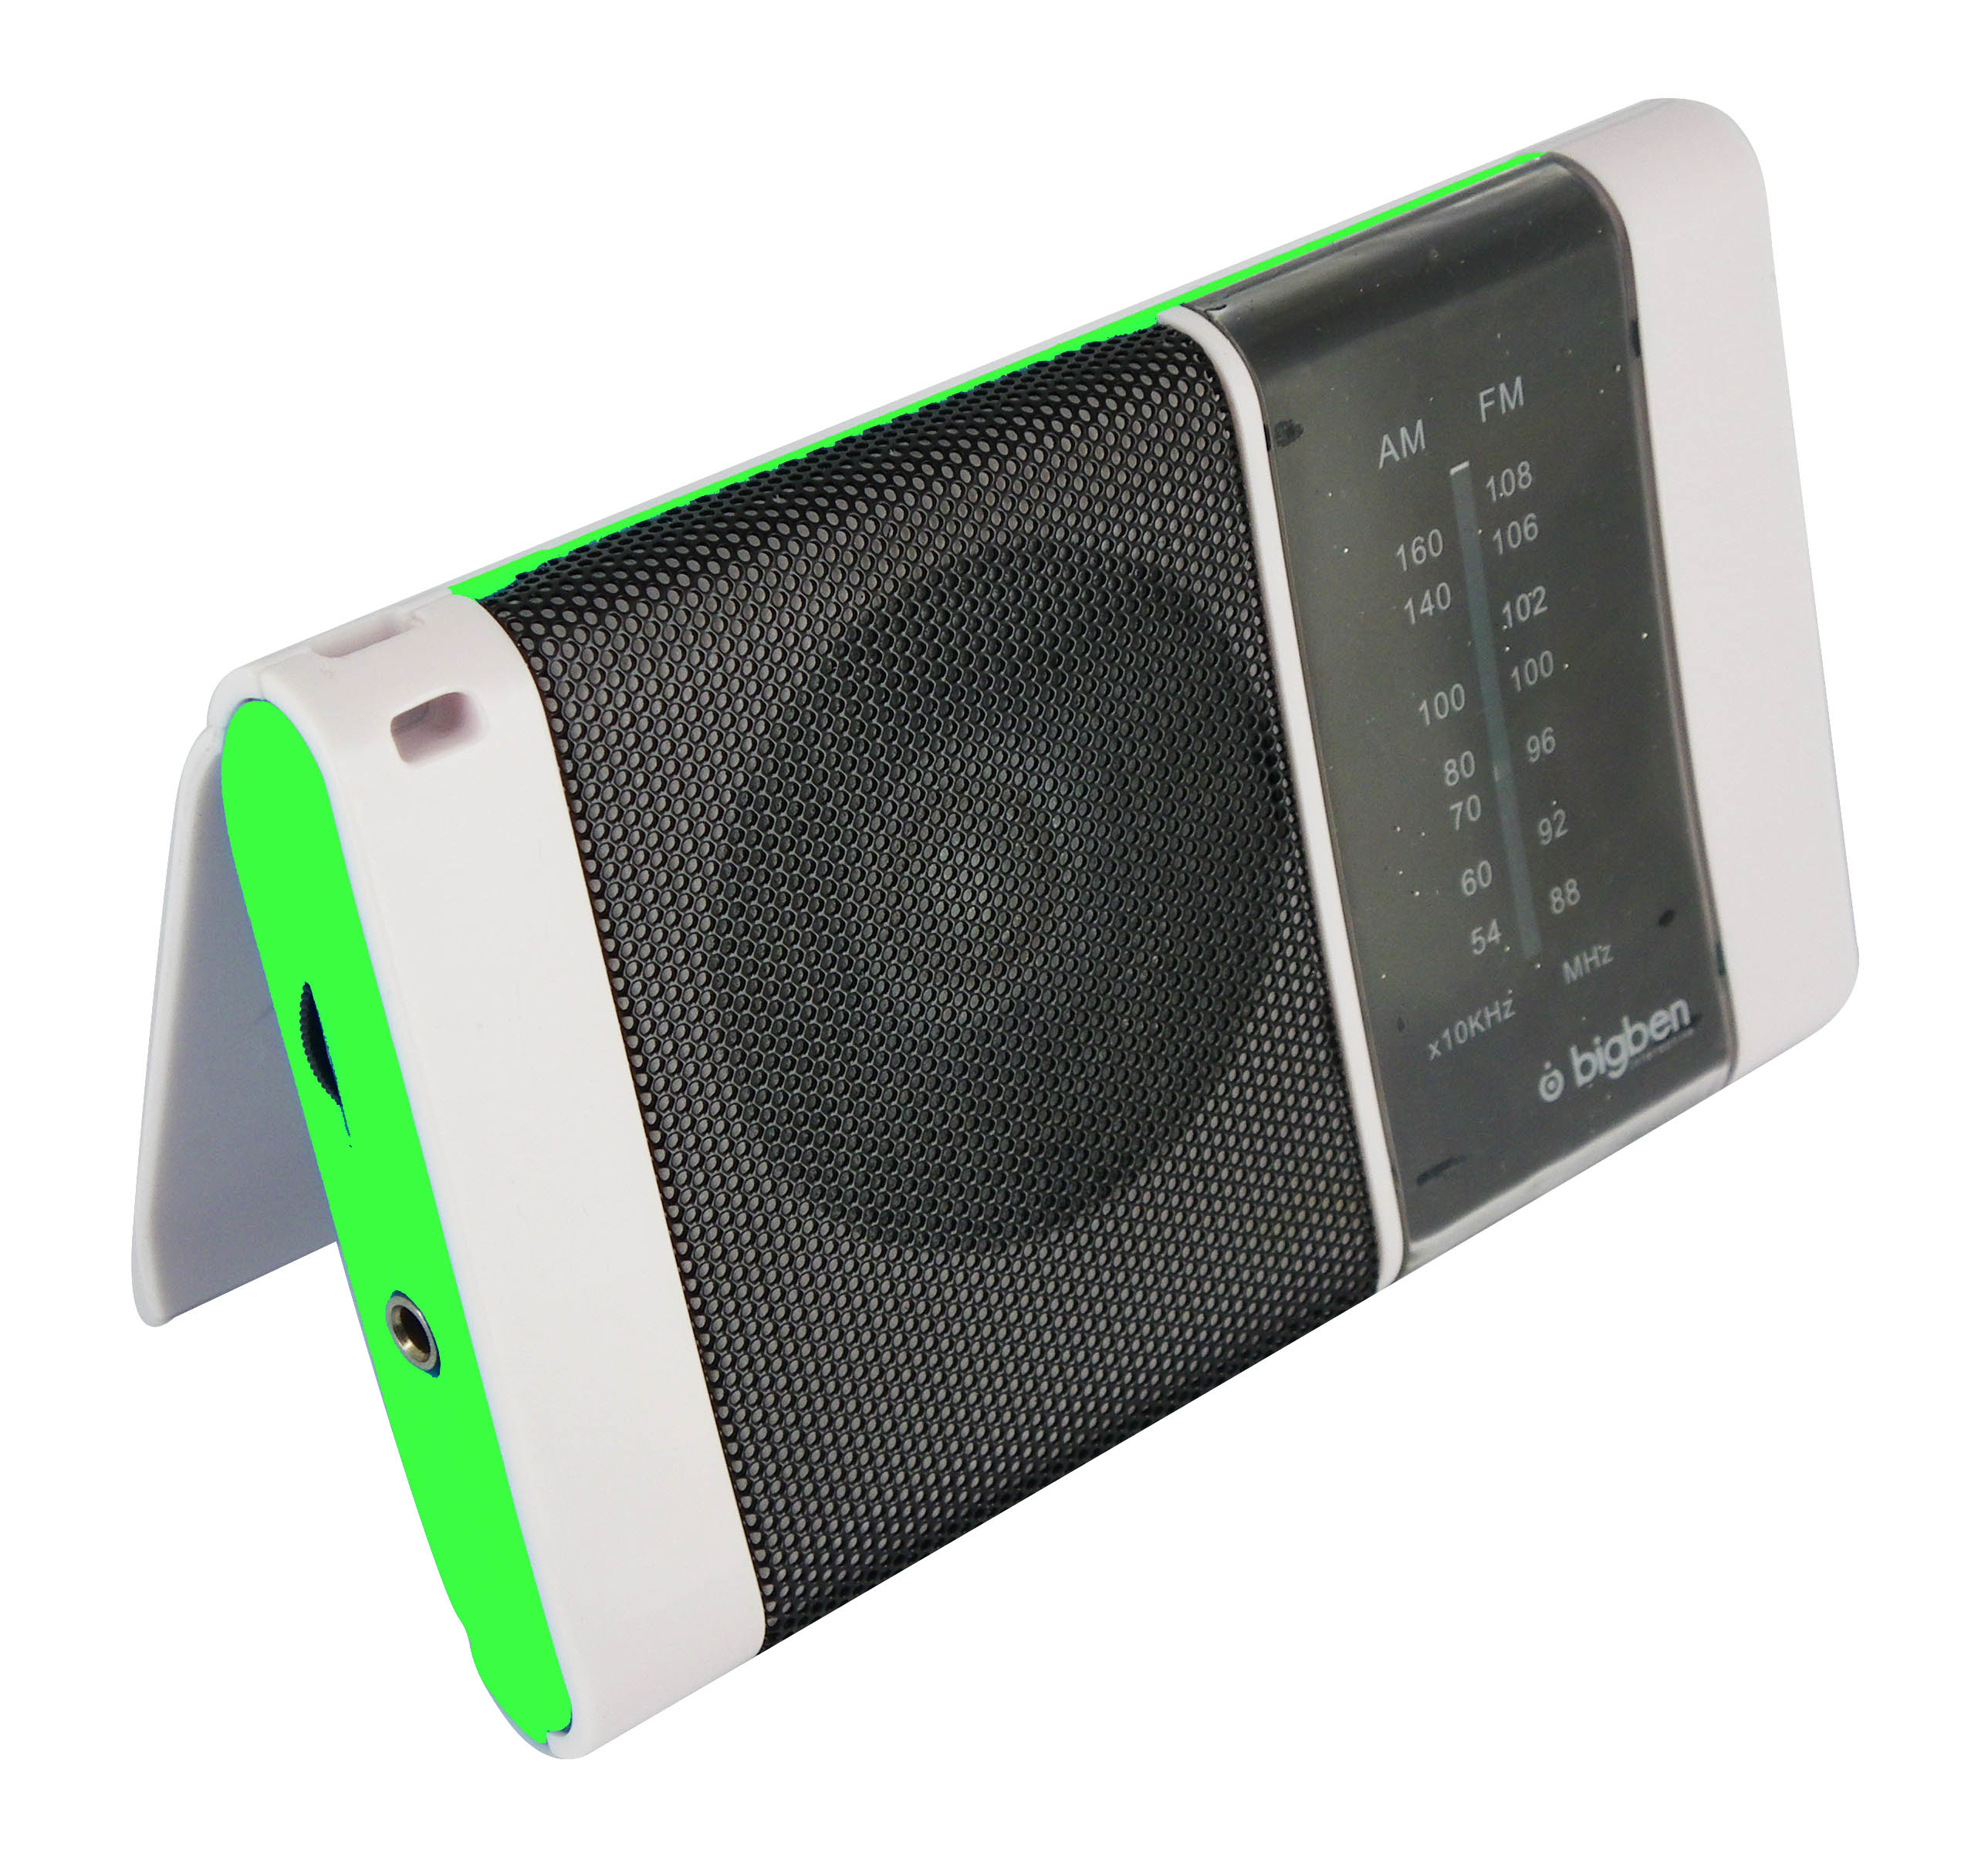 Bigben Interactive TR10V Portatile Blu, Verde, Bianco radio